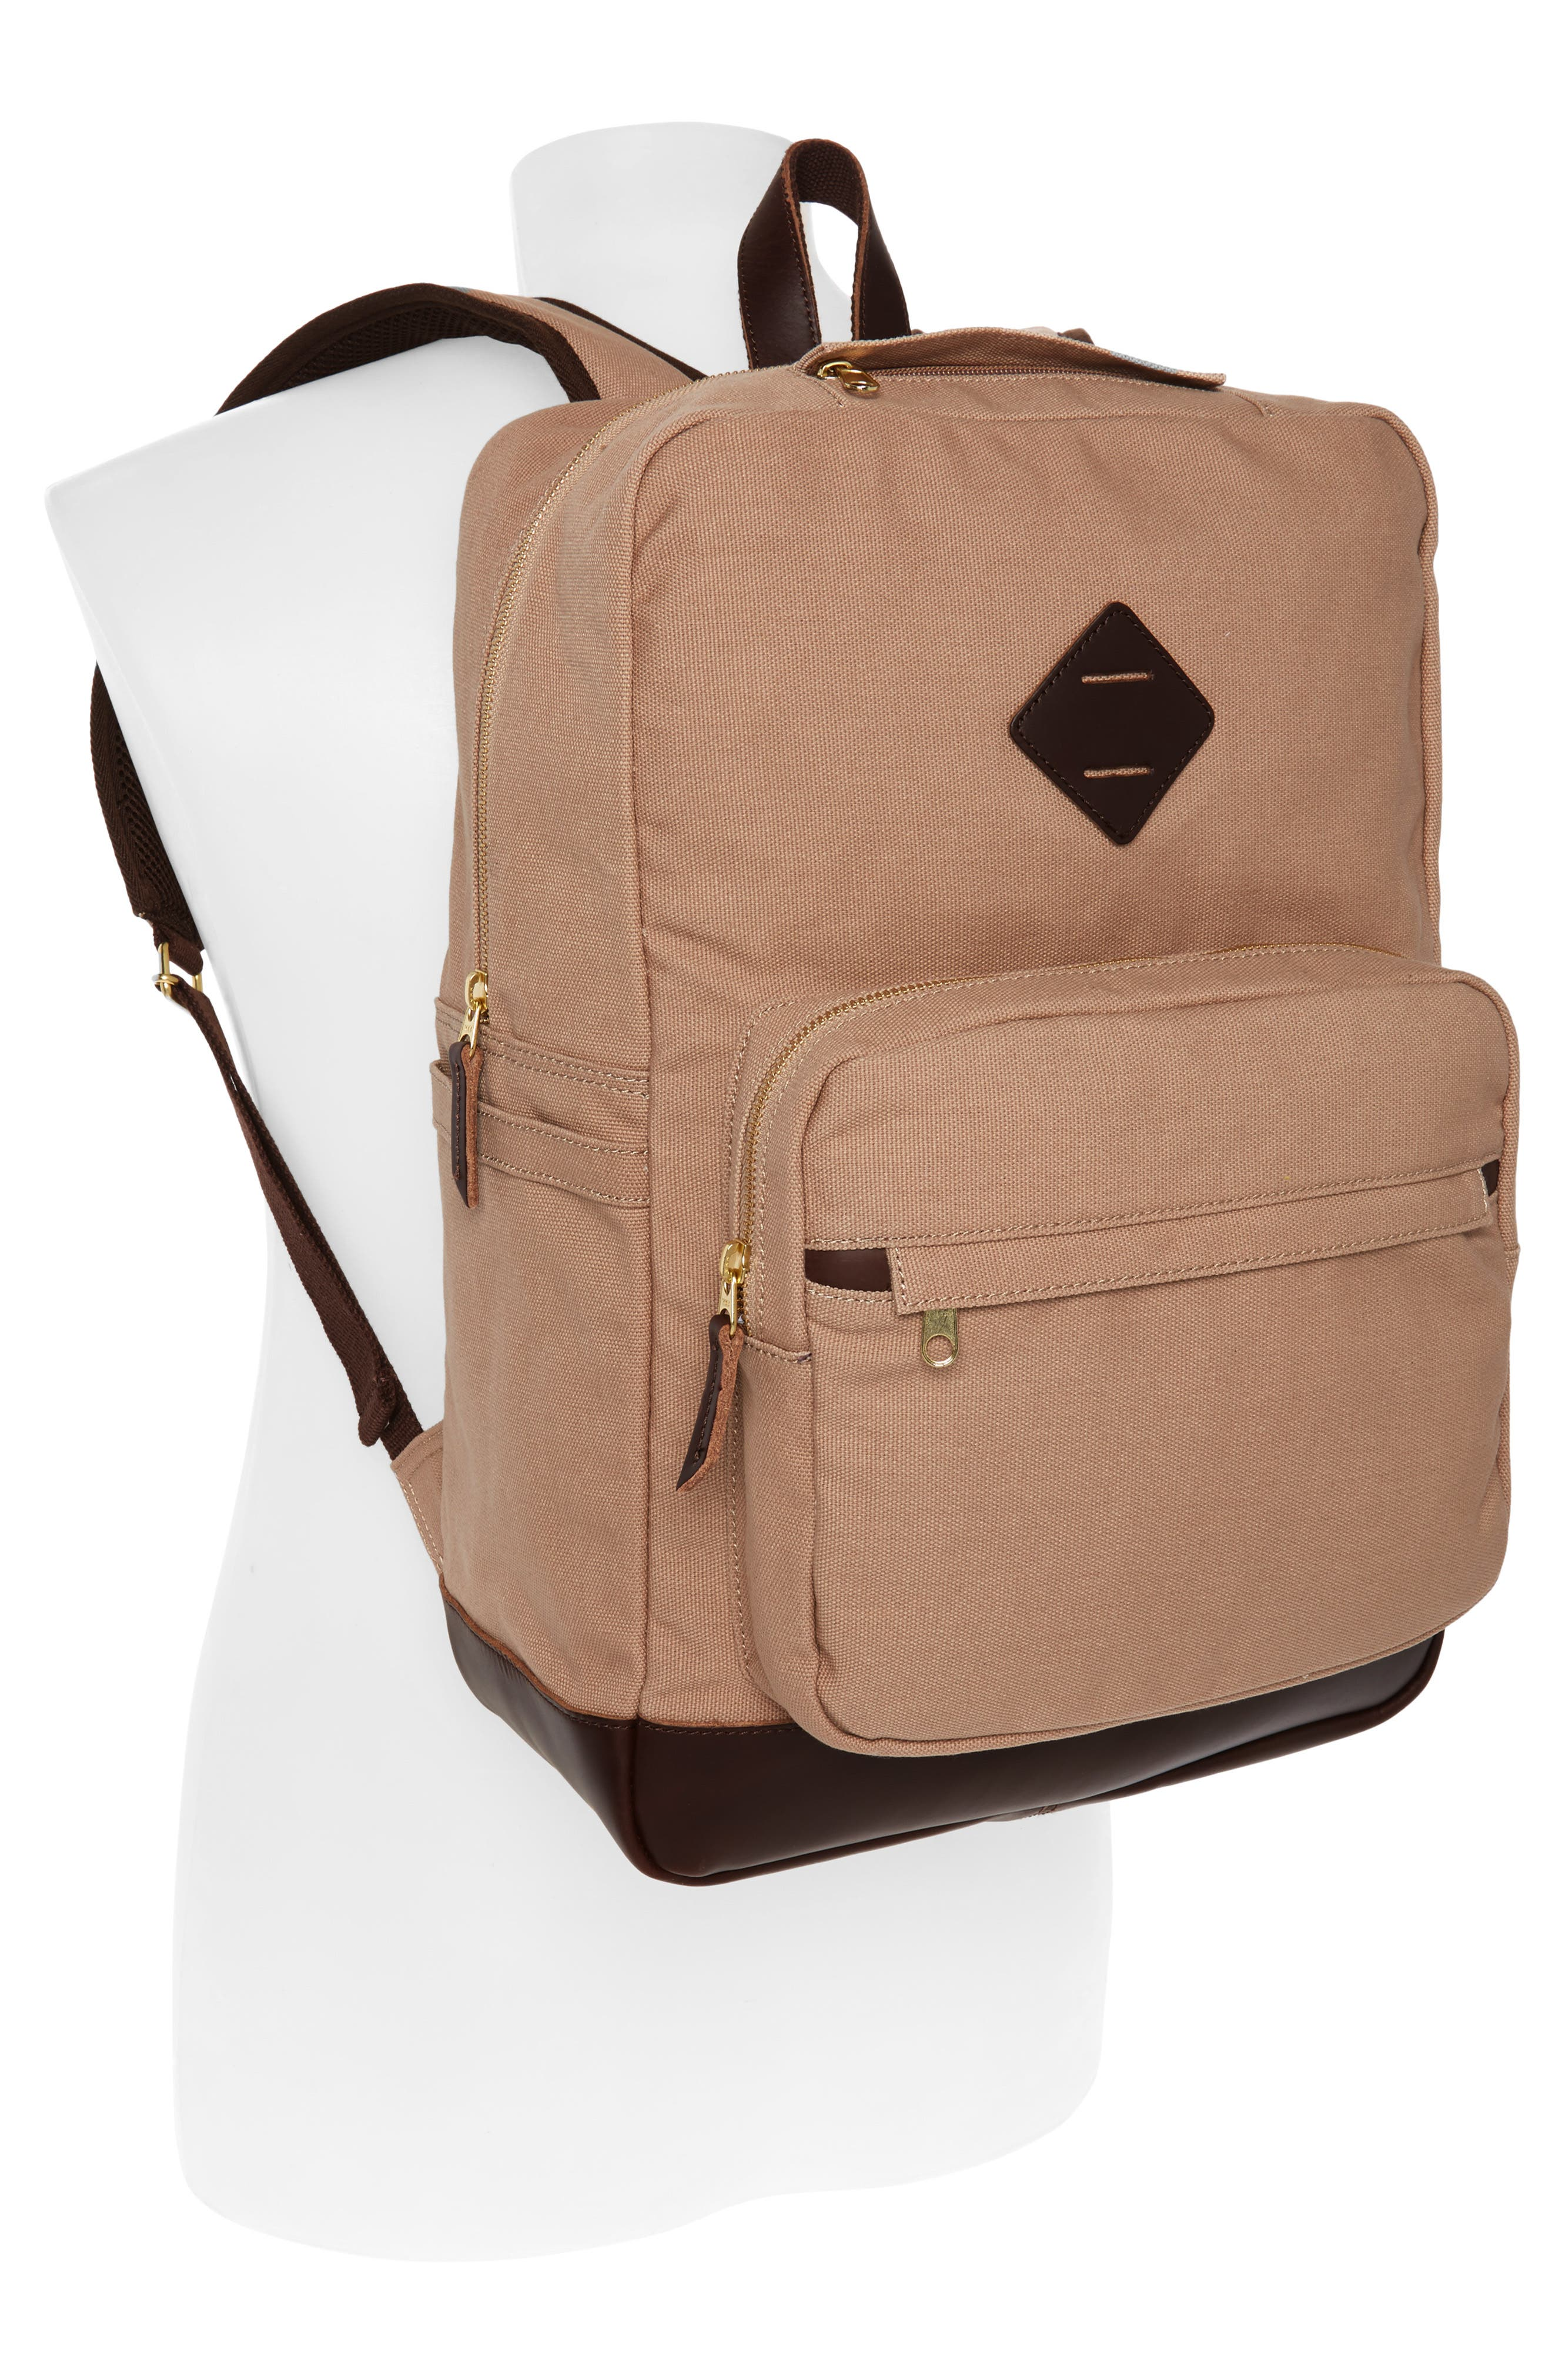 Hudderton Backpack,                             Alternate thumbnail 2, color,                             250